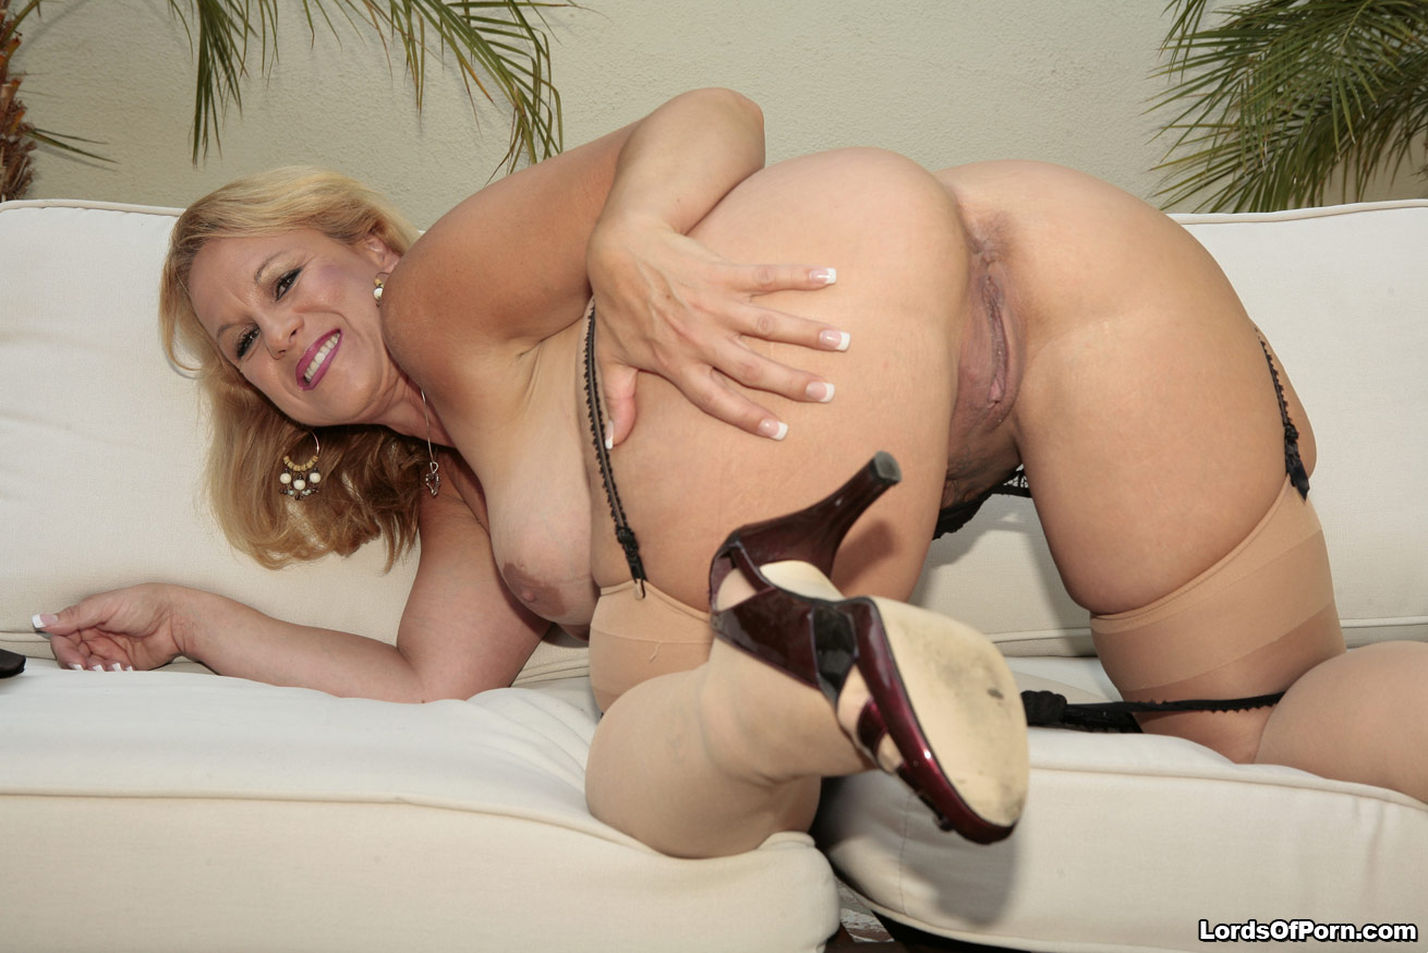 gratis porno film booty porn